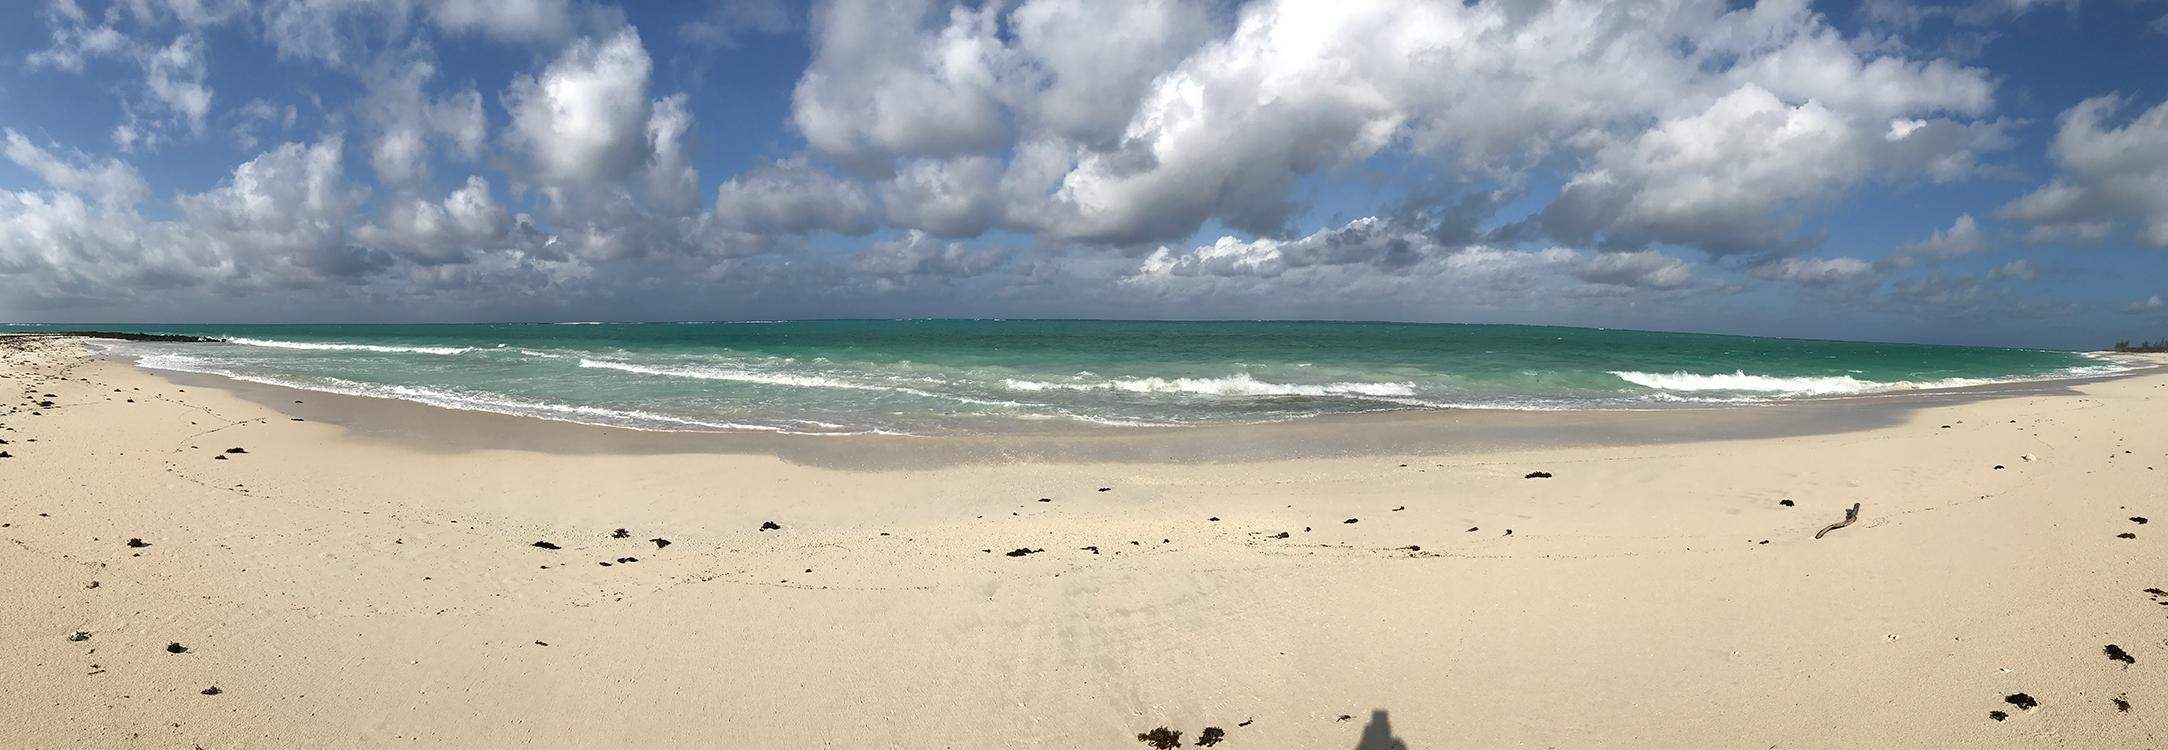 Beach-Panorama-Castaway